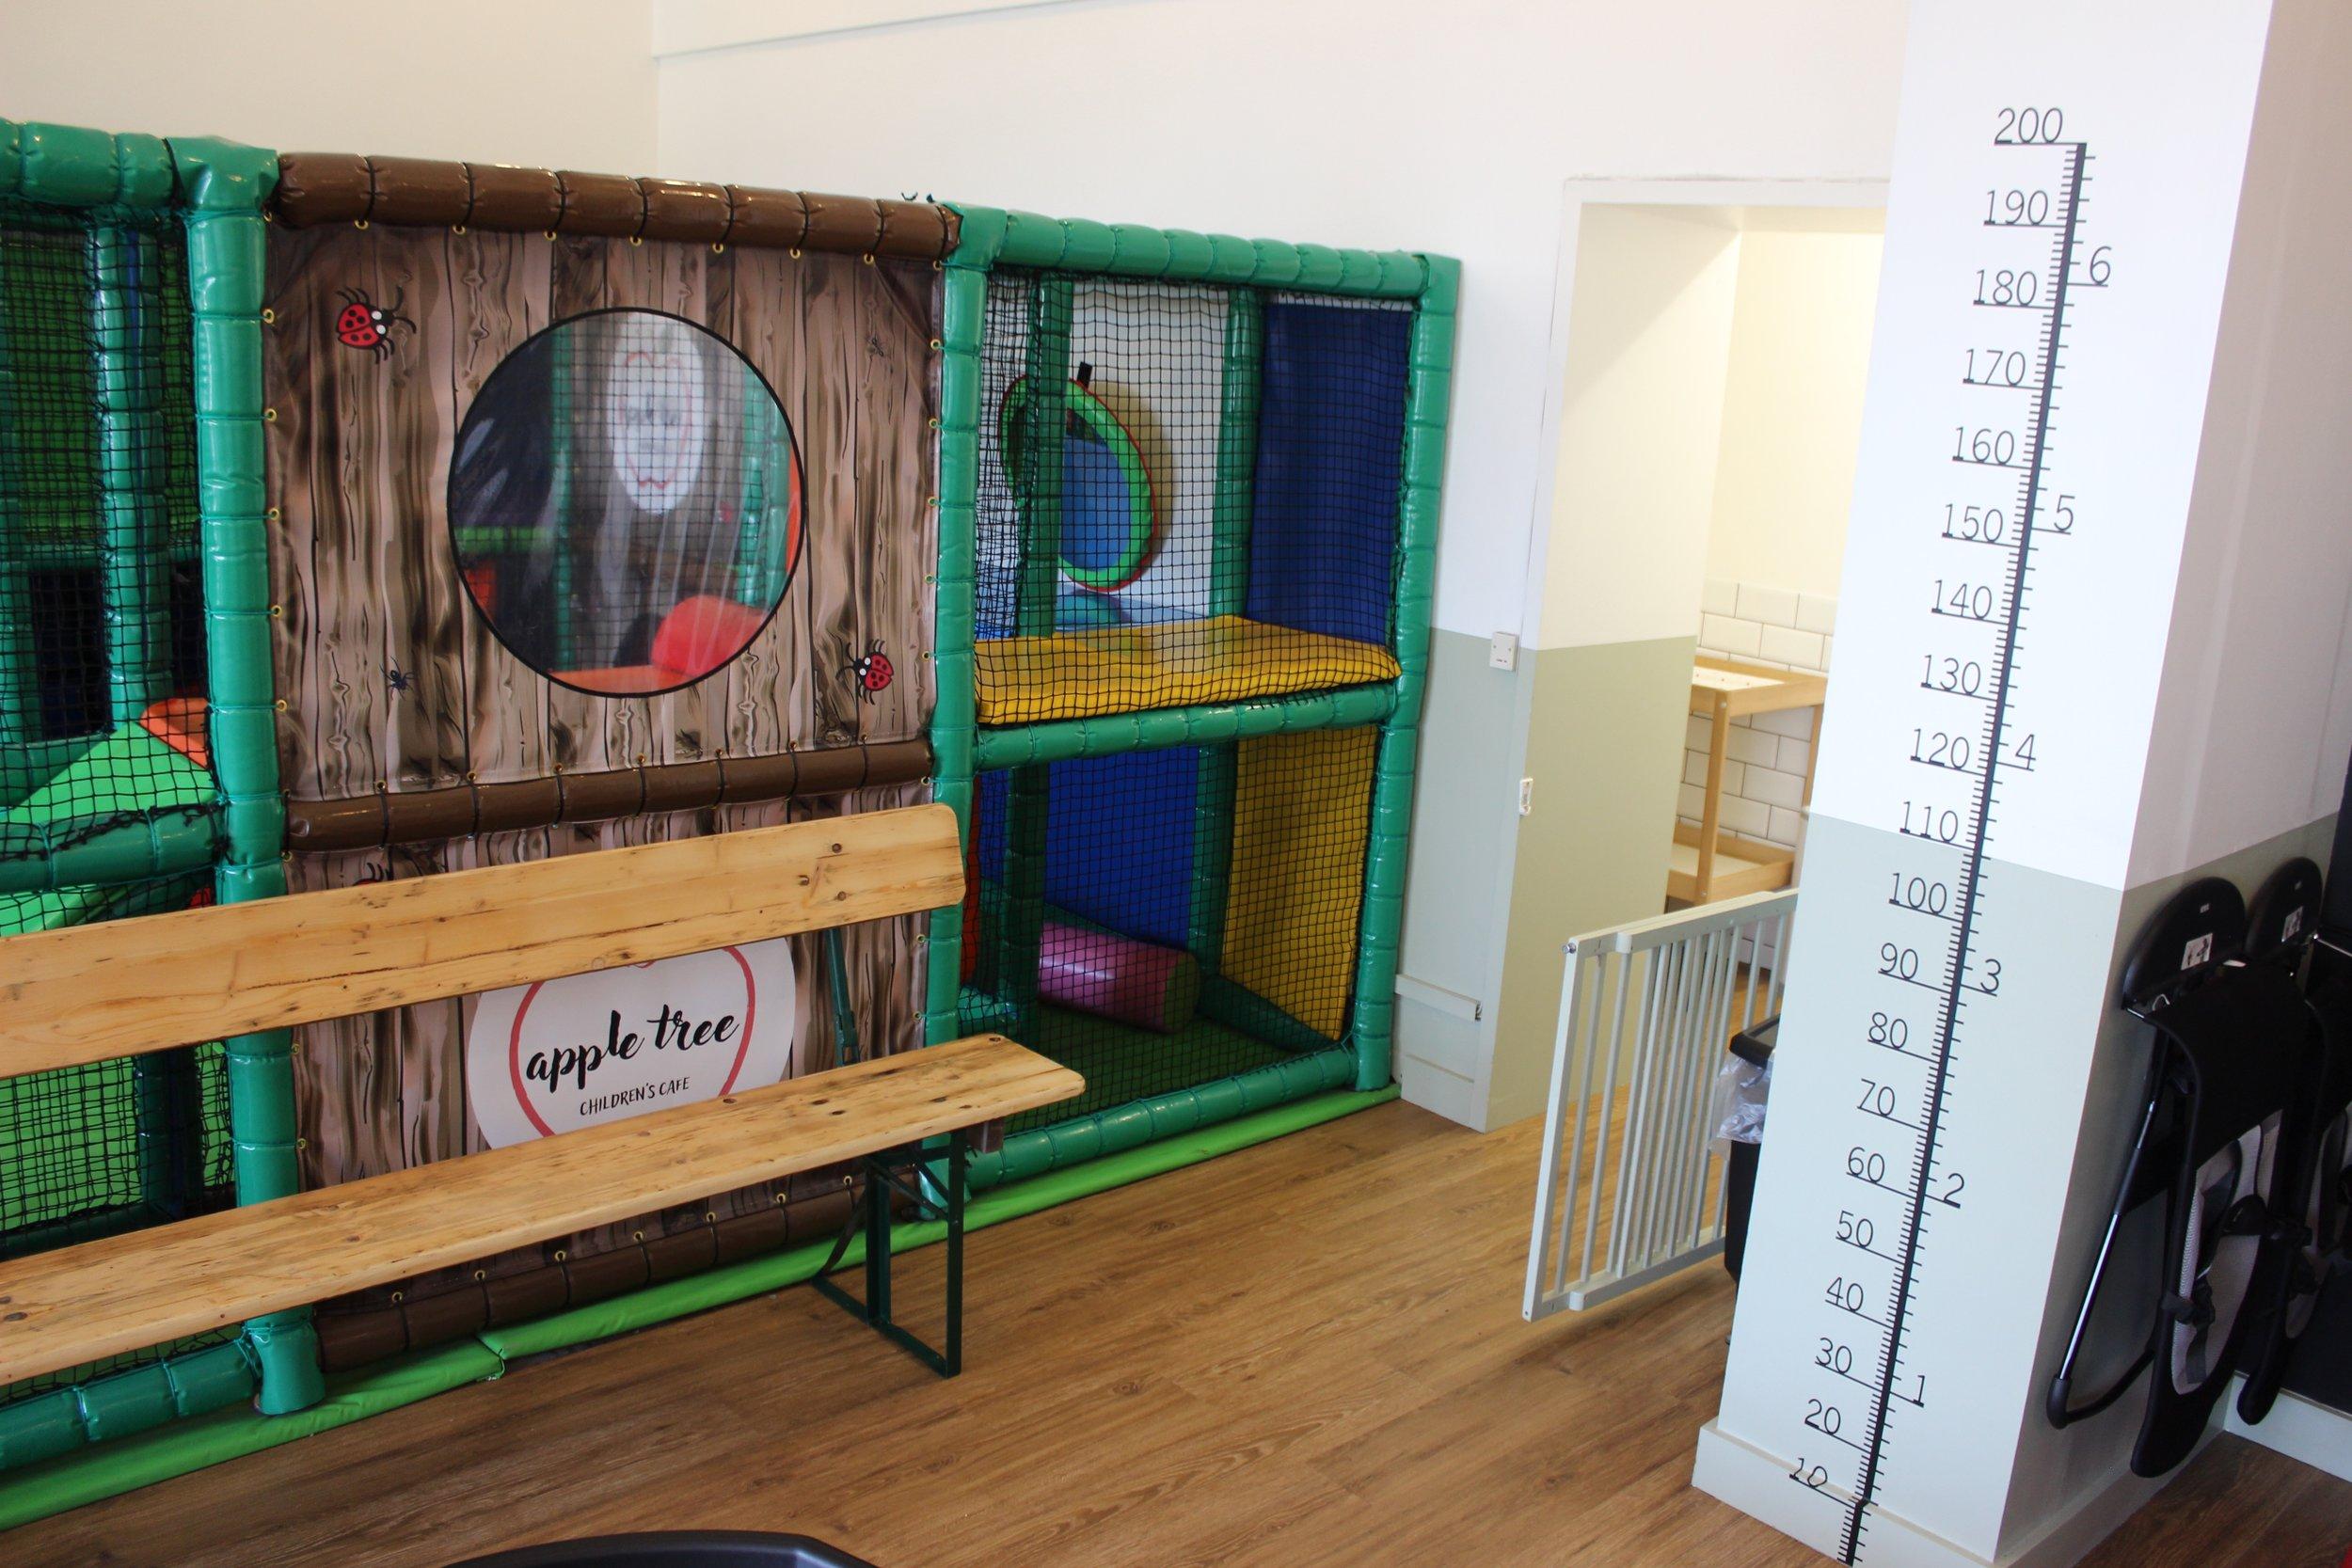 Apple Tree Children's Cafe in Herne Hill South London 15.jpg